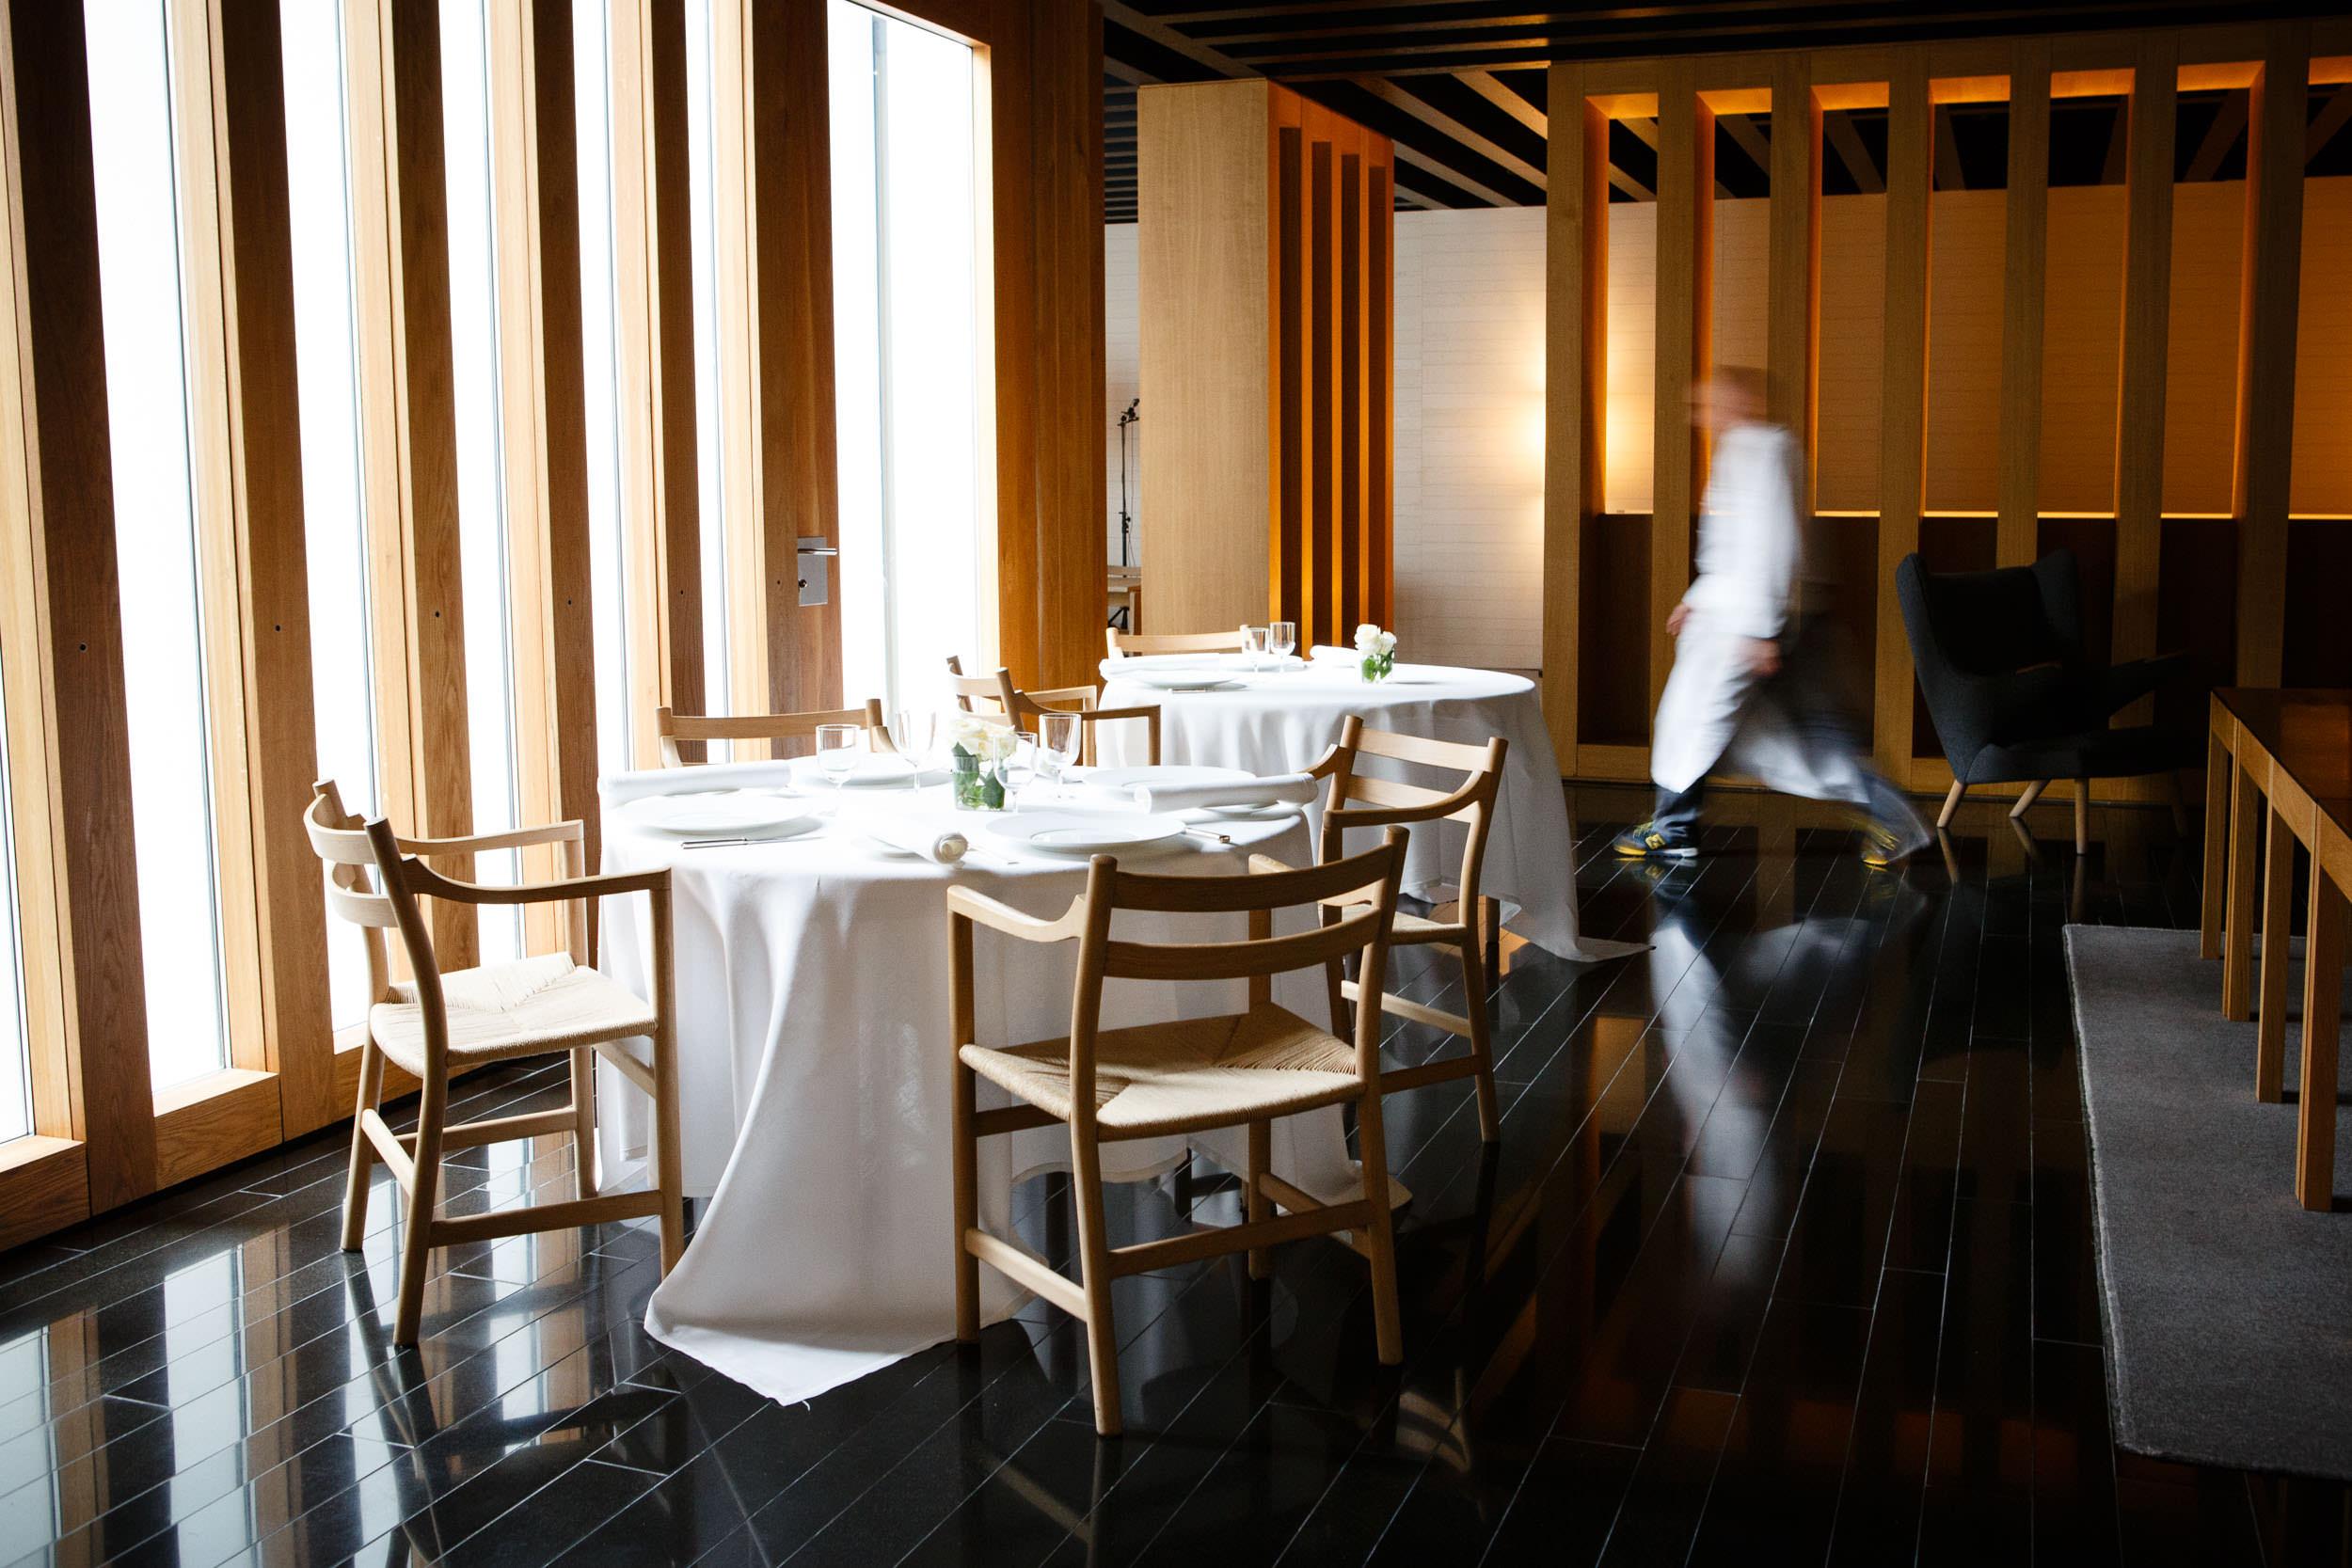 2/1/14 Two Michelin-star chef Toño Pérez at work in Restaurante Atrio, Cáceres, Extremadura, Spain. Photo by James Sturcke Fotografía | www.sturcke.org